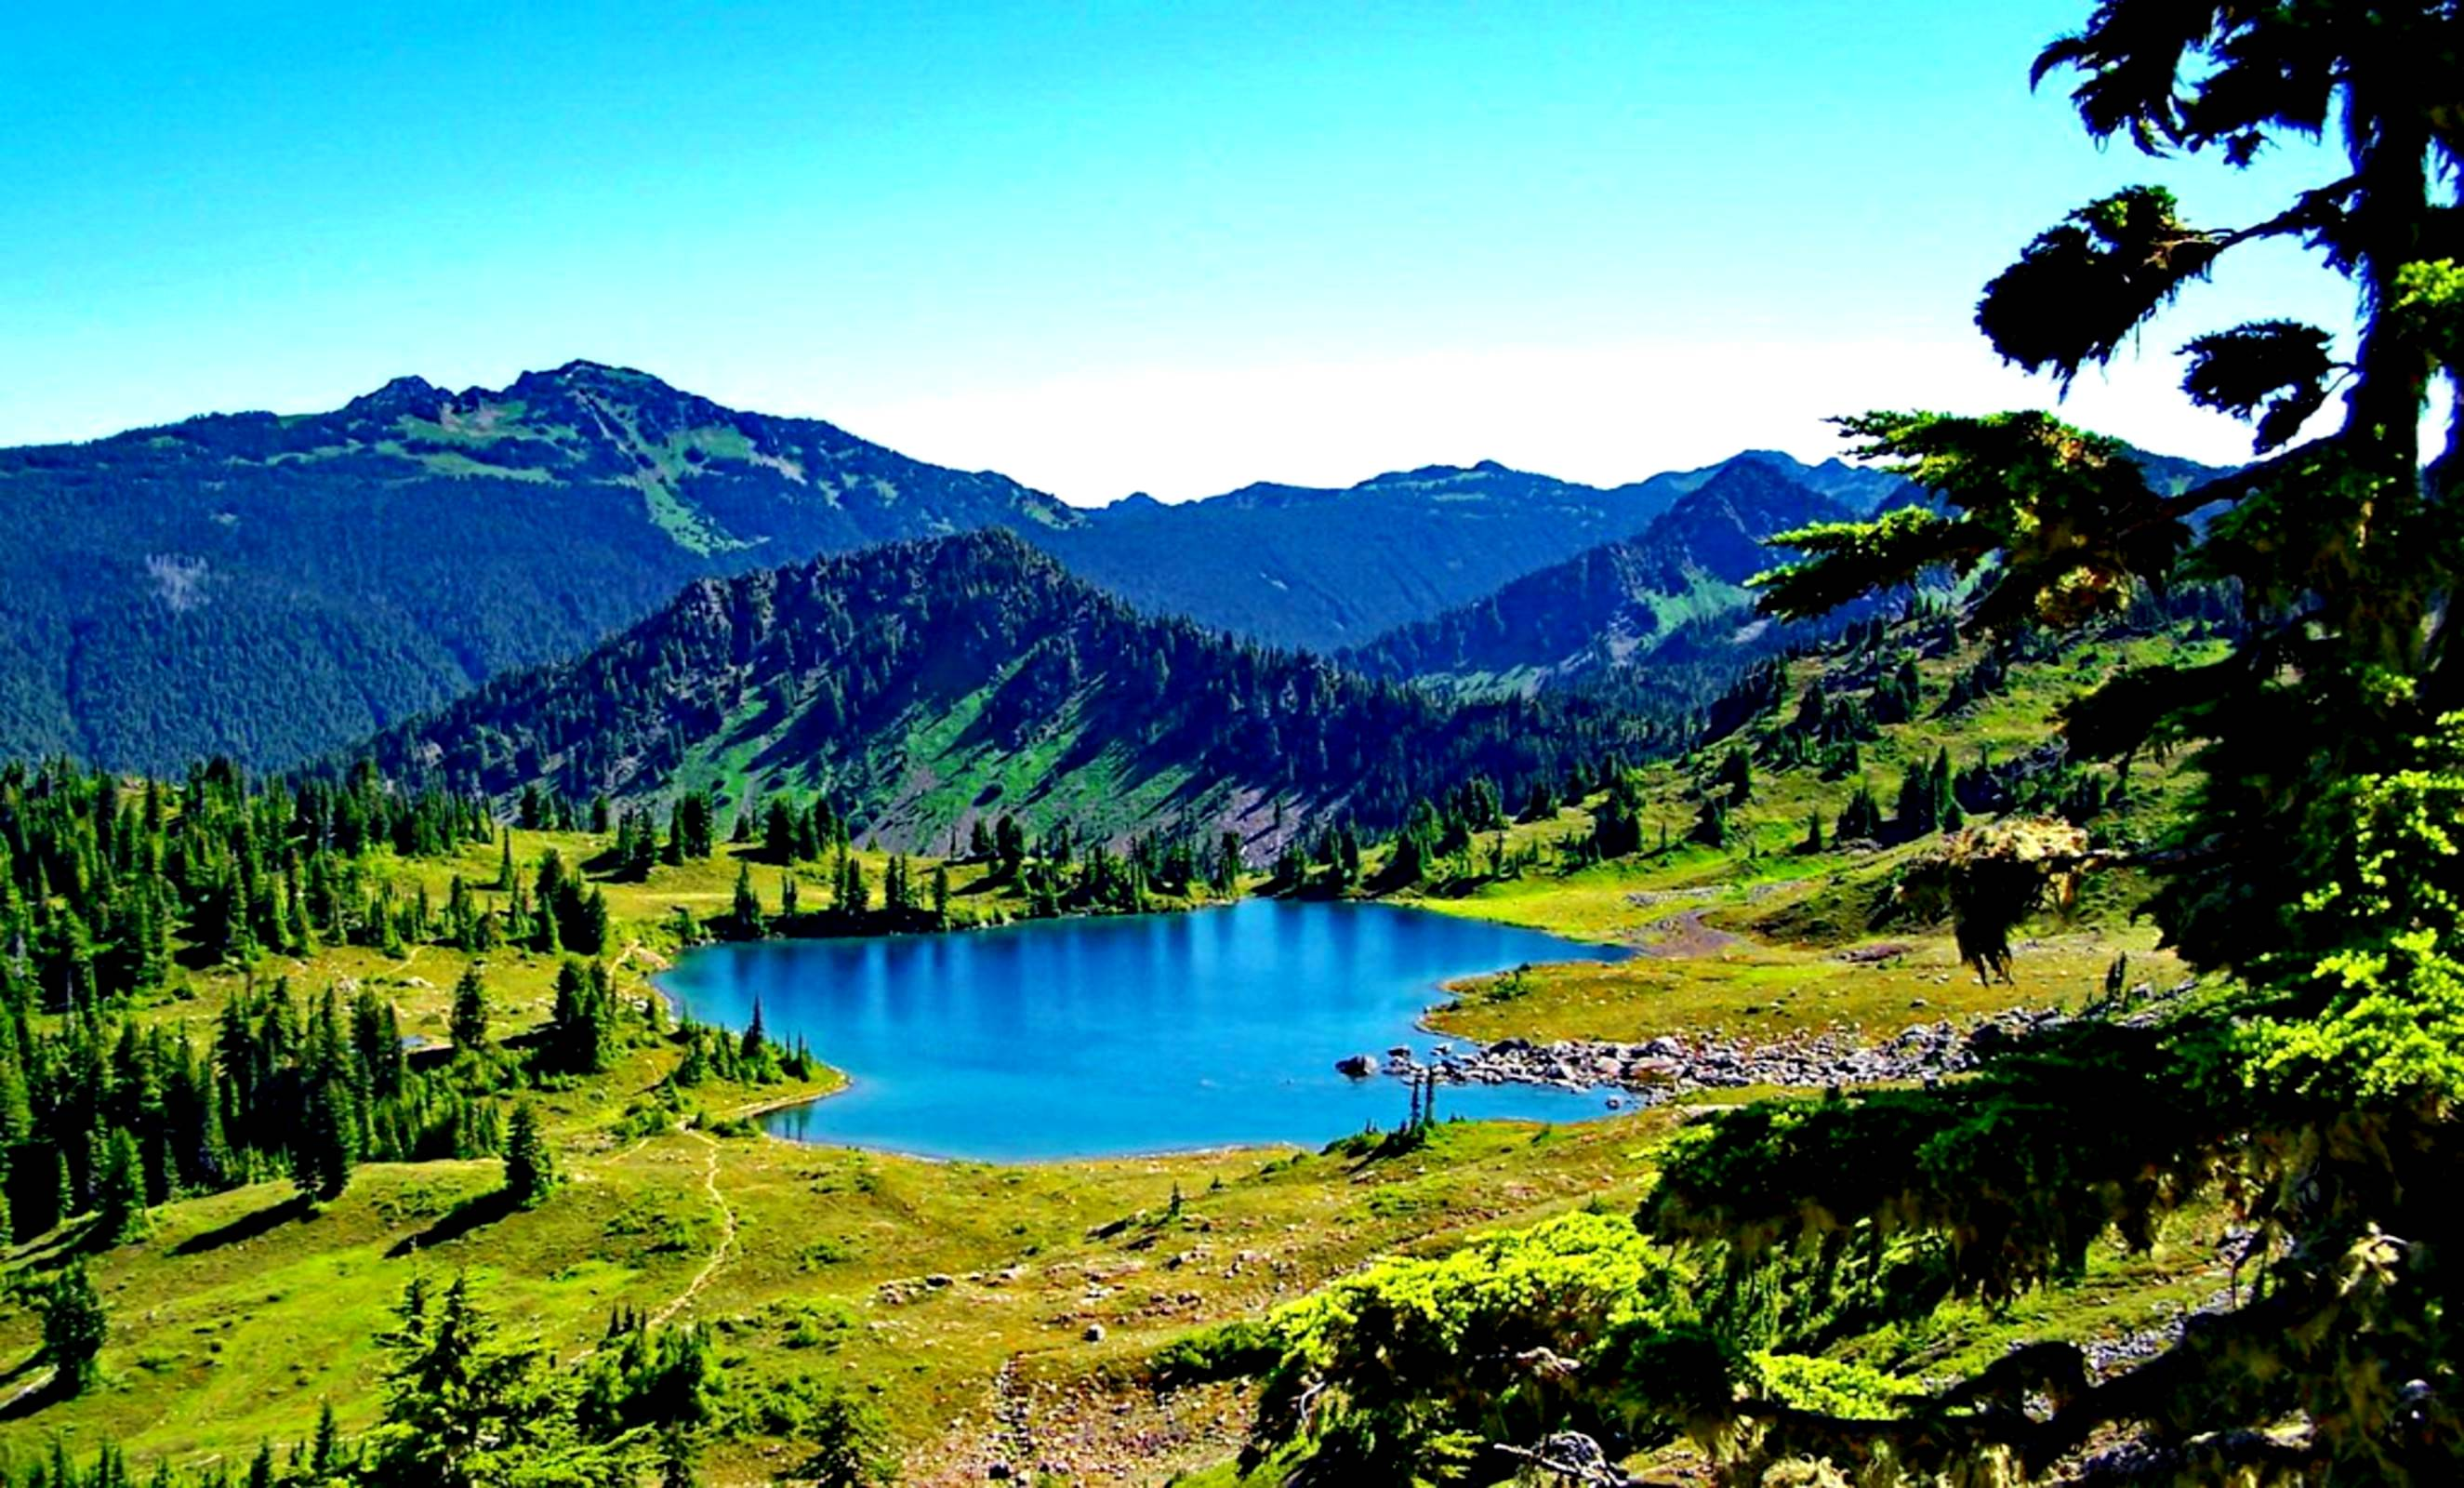 озеро в парке олимпик